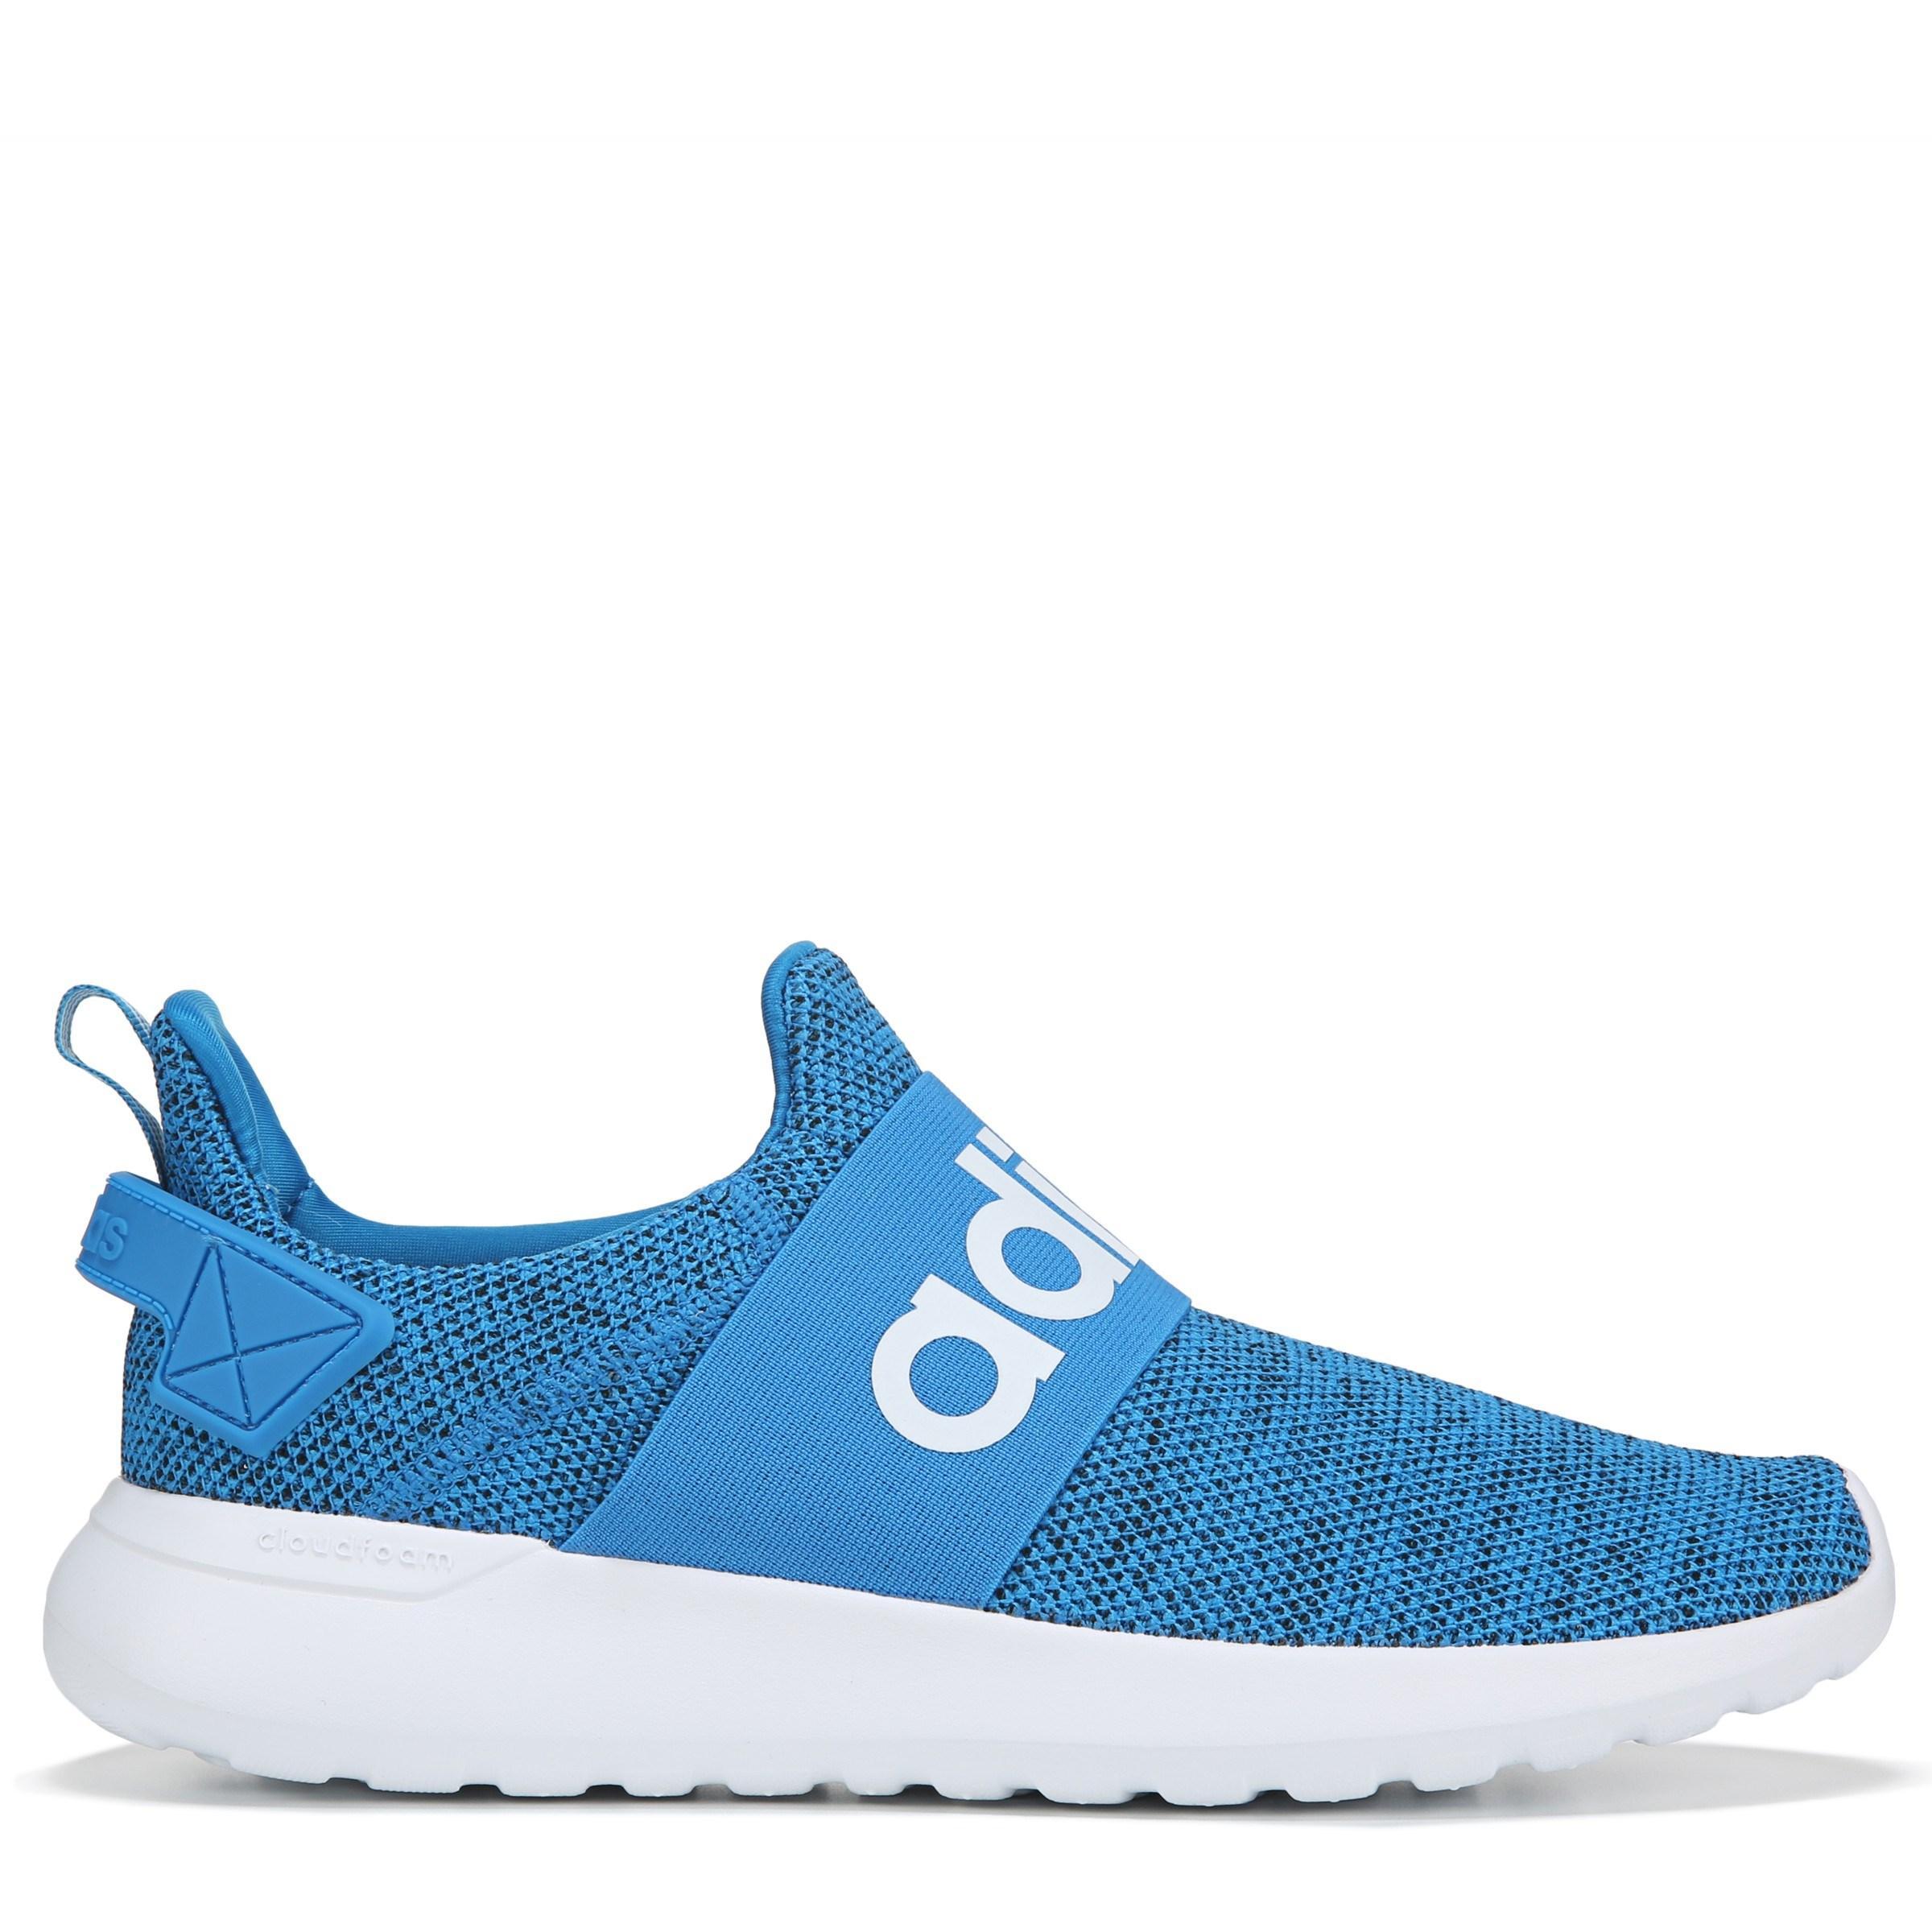 Cloudfoam Adapt Slip On Sneakers